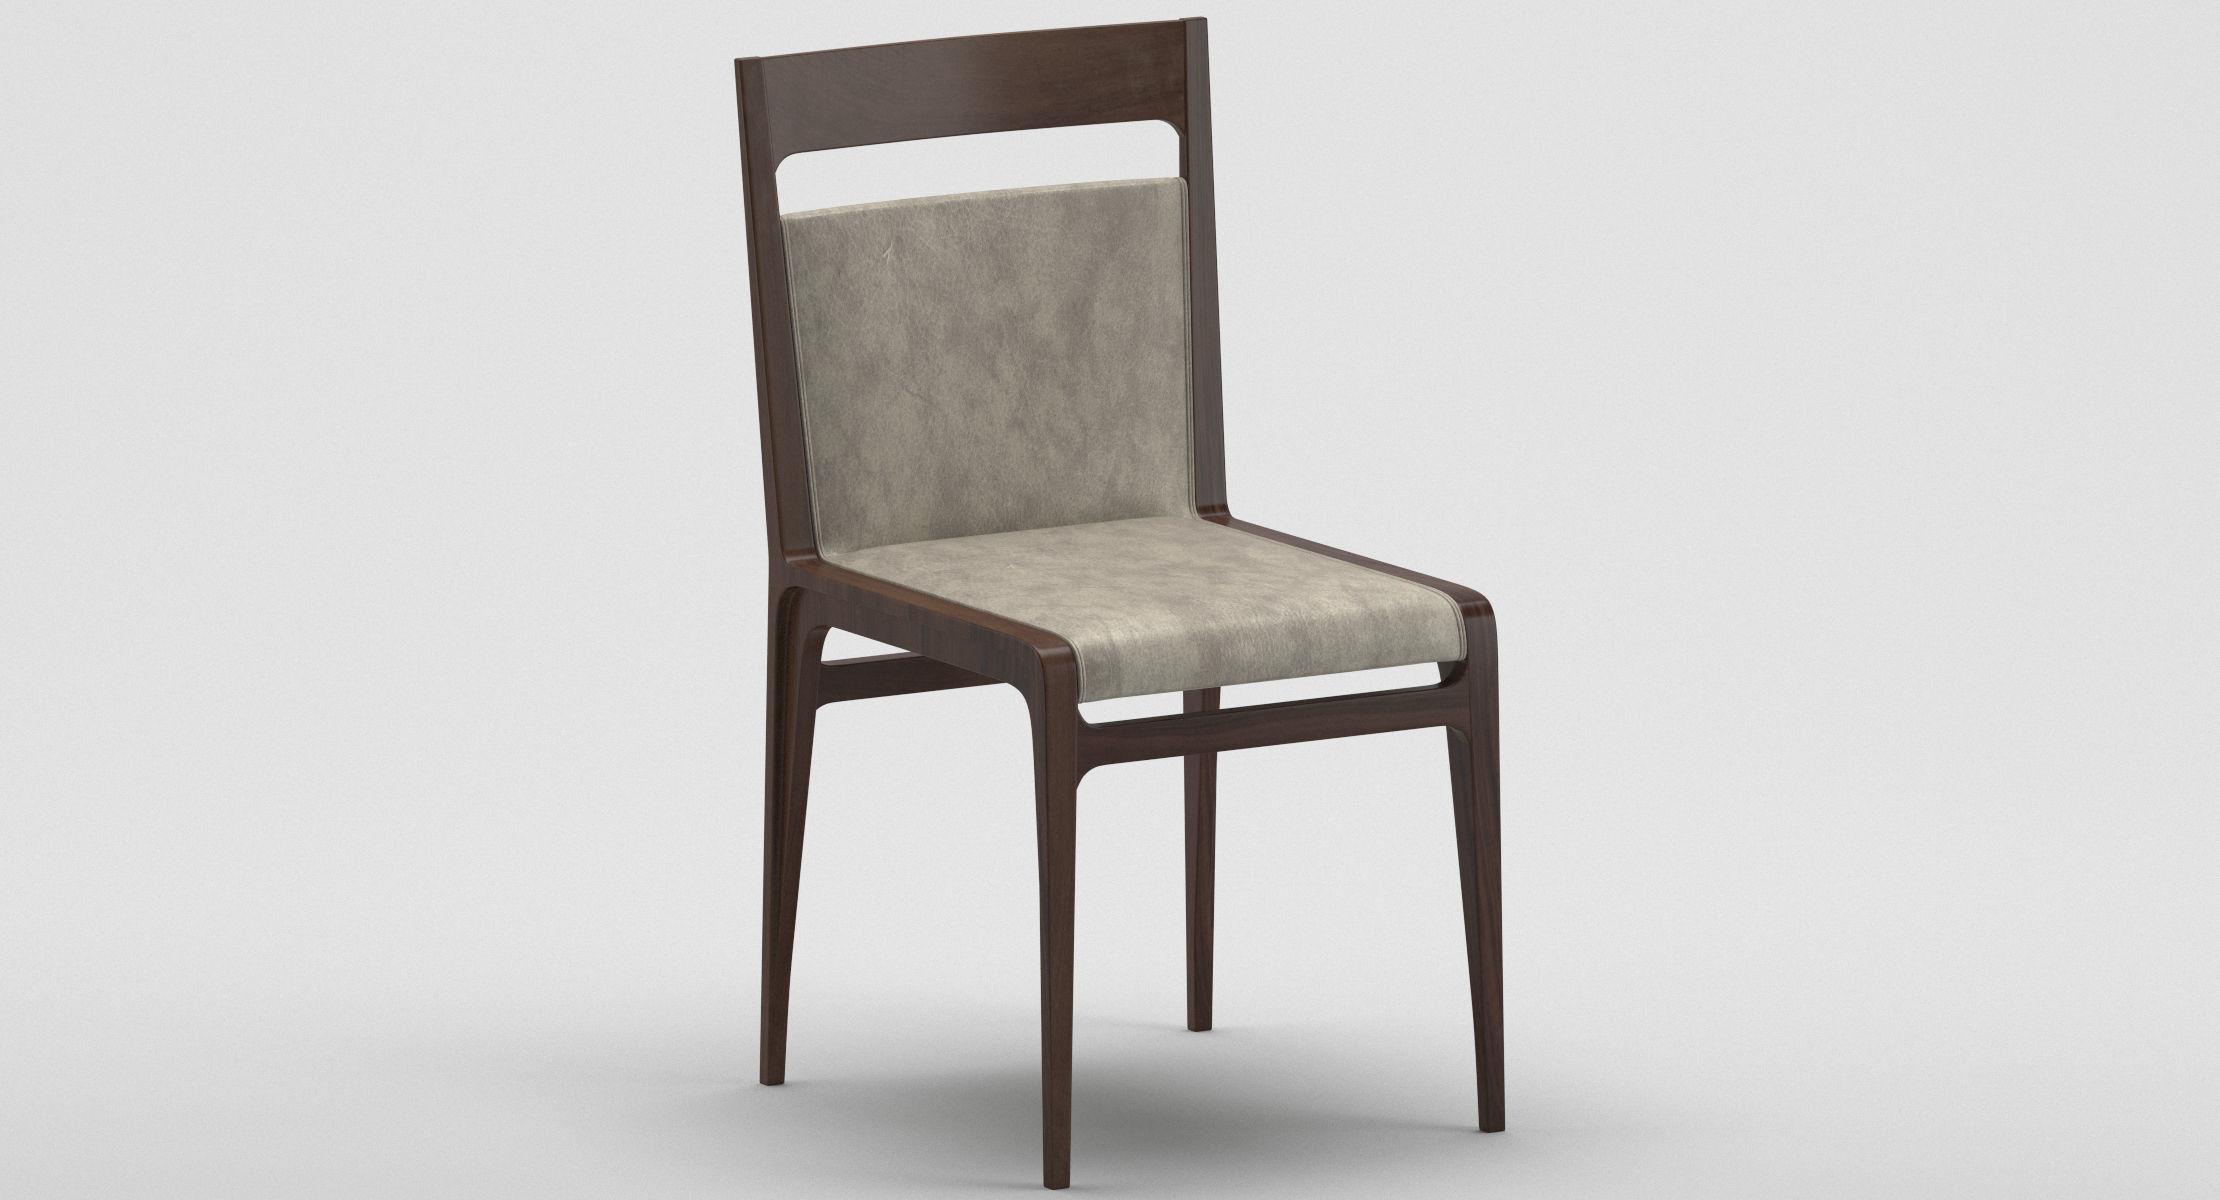 Super Roche Bobois Stephane Leburn Assemblage Chair 3D Model Bralicious Painted Fabric Chair Ideas Braliciousco